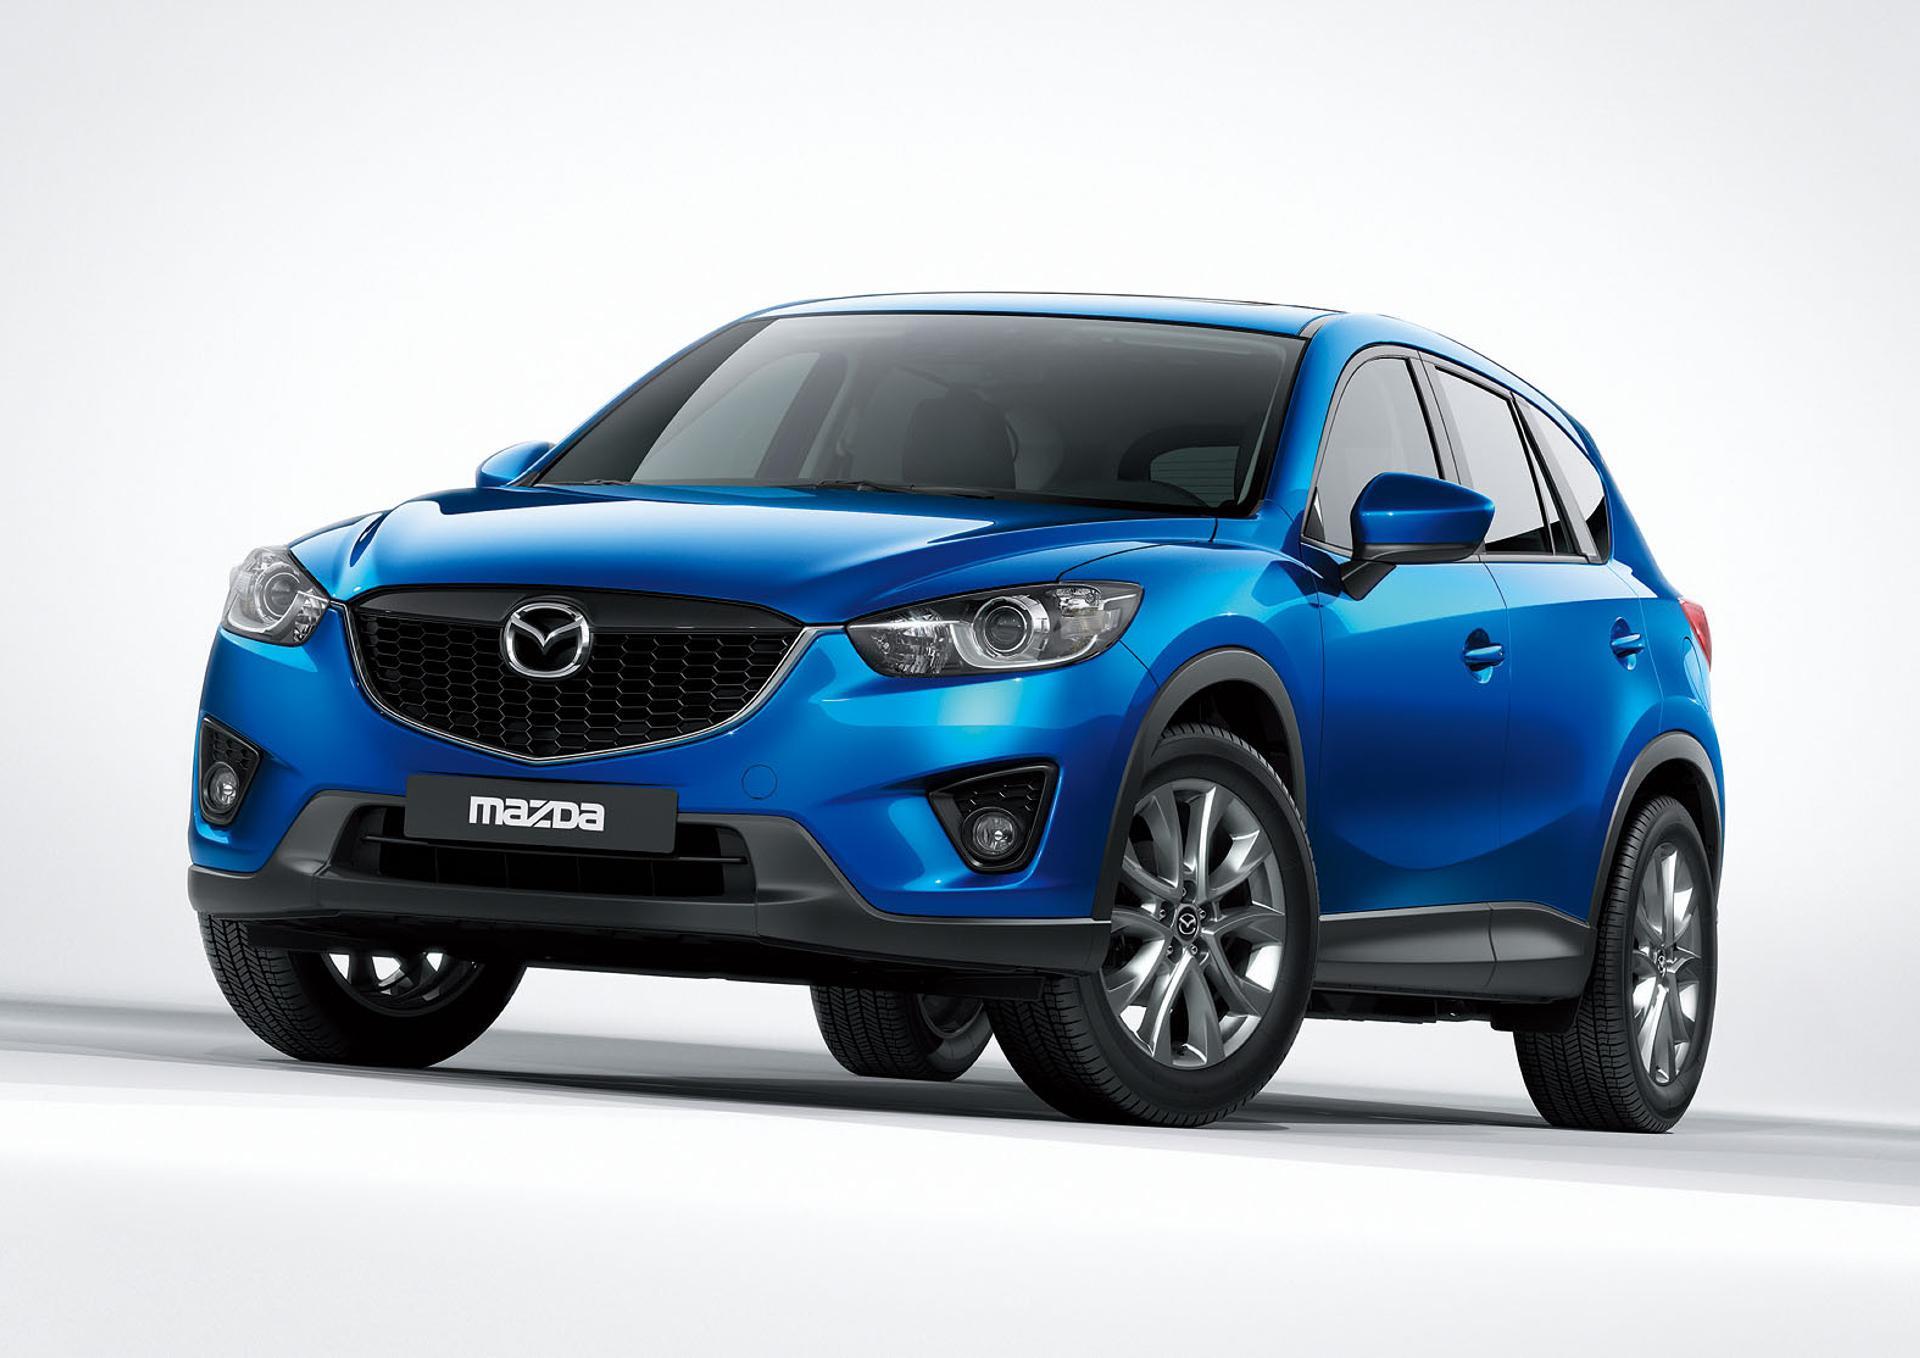 https://www.conceptcarz.com/images/Mazda/Mazda-CX-5-Crossover-2012-Image-01.jpg